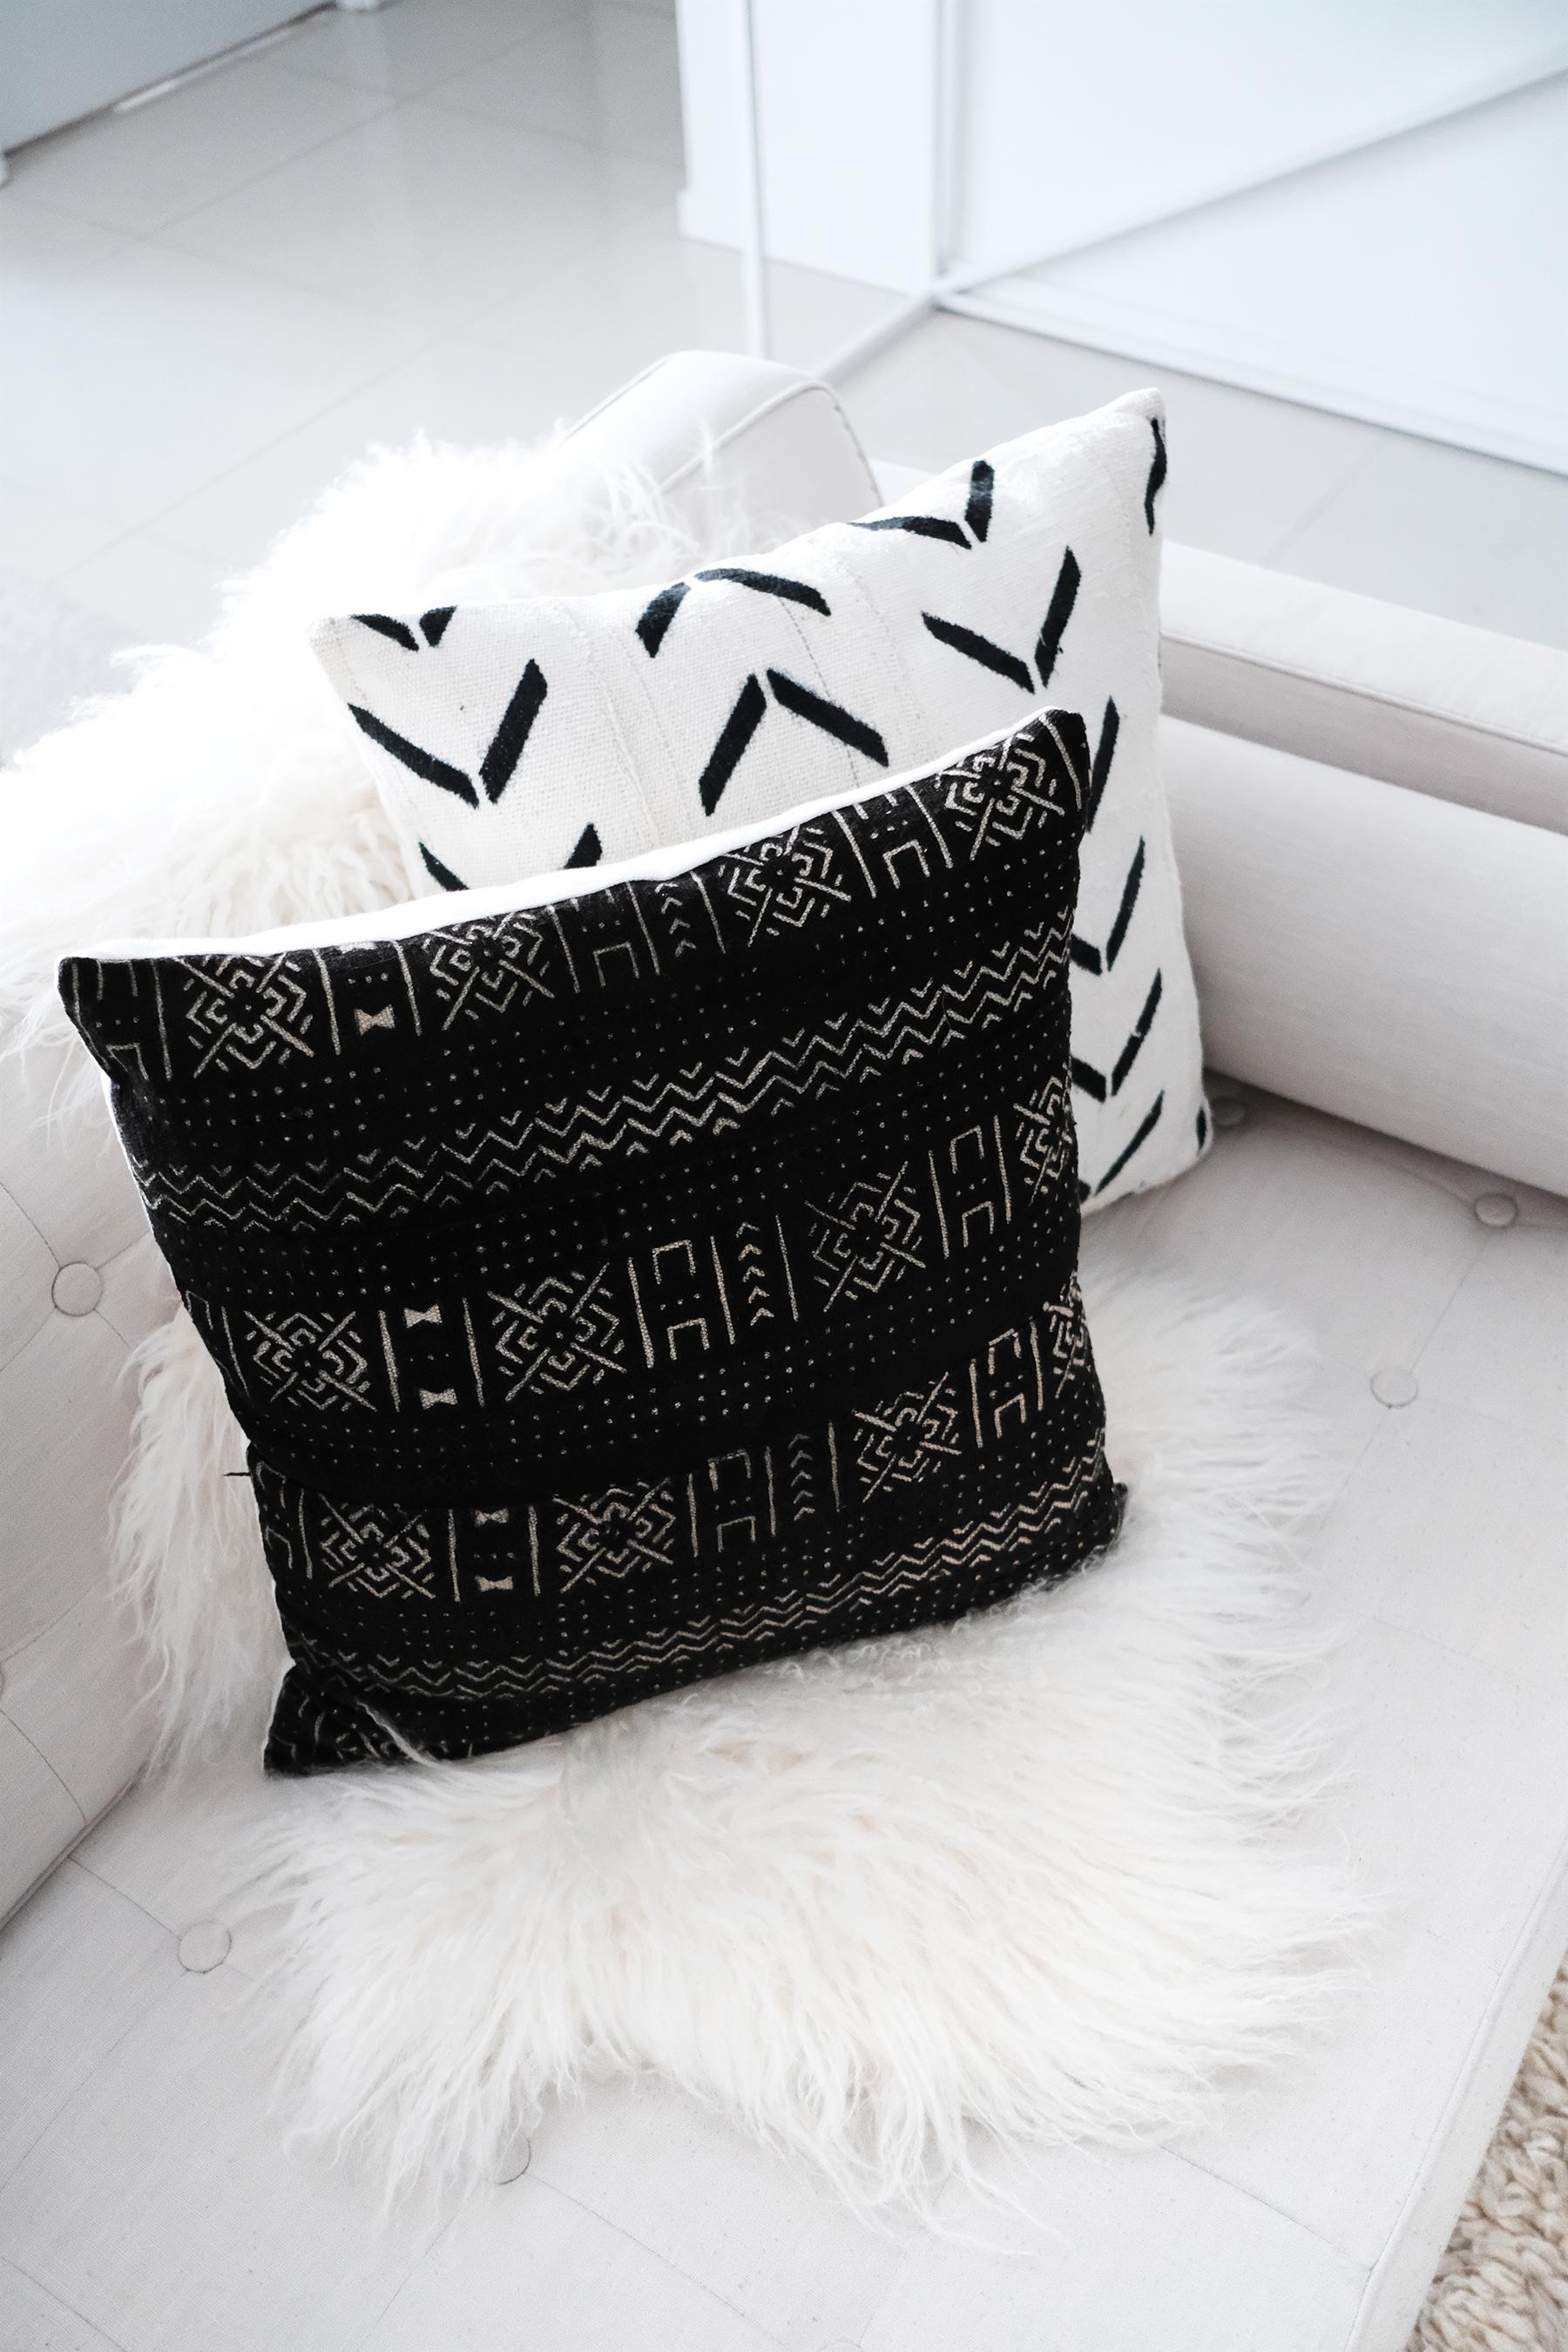 mucloth_cushions_australia_black_white_monochromatic_stylish.jpg